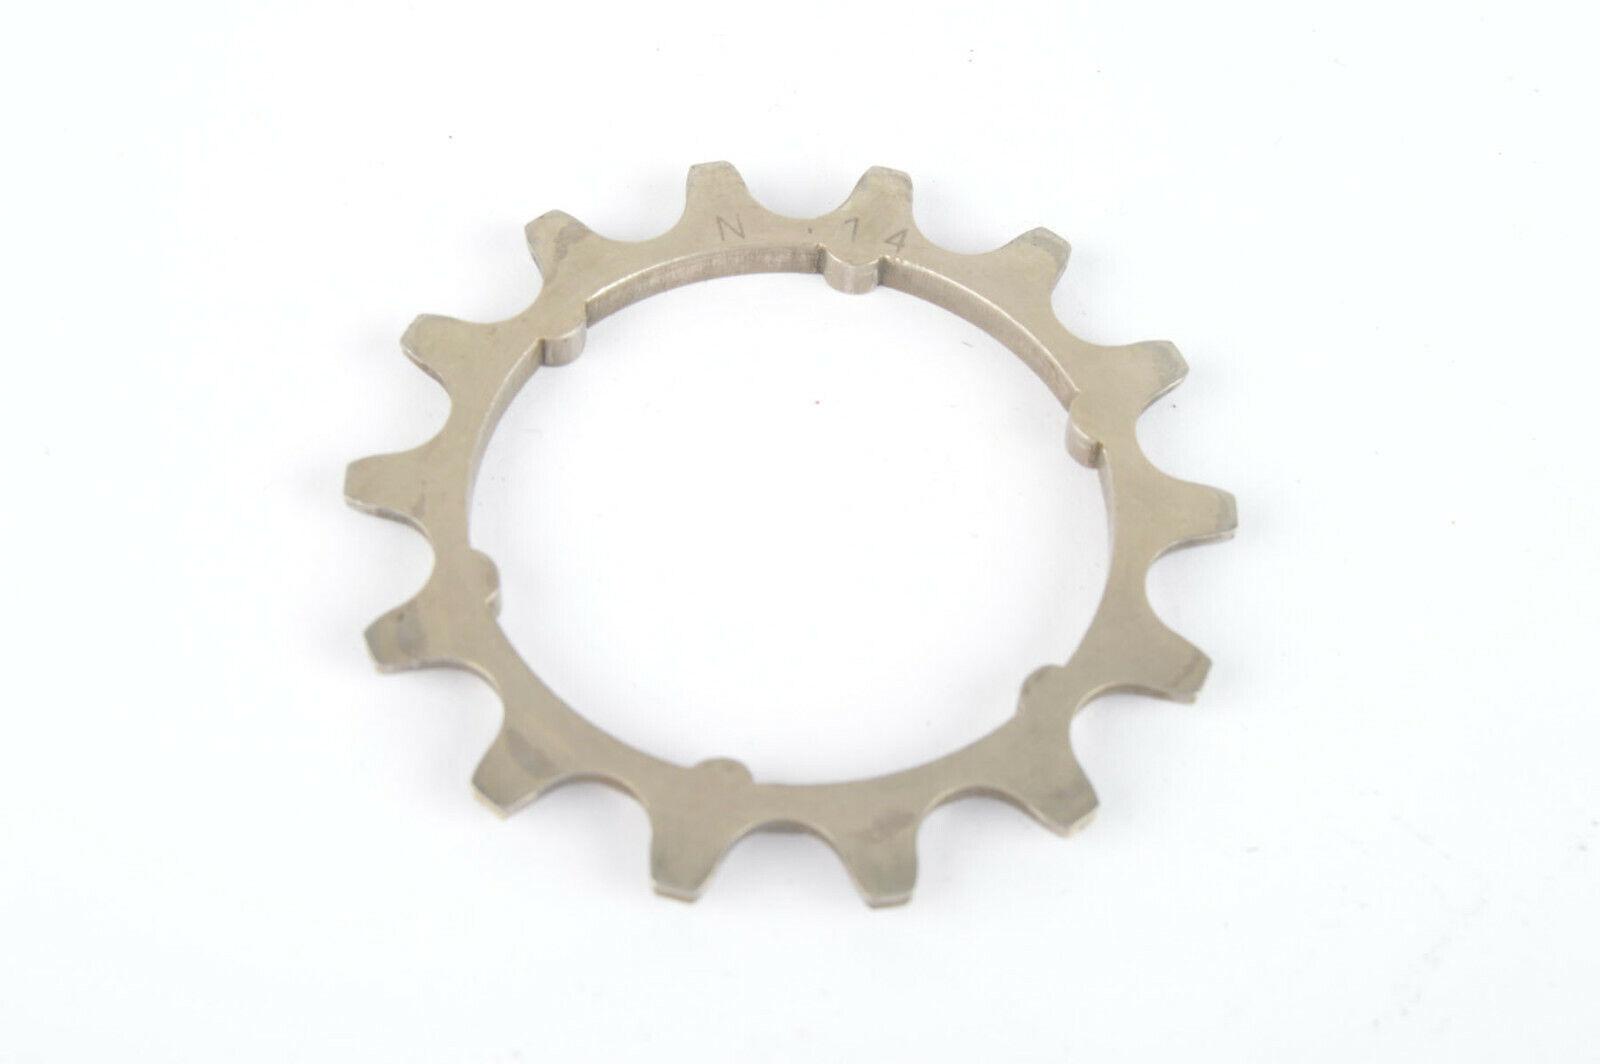 Campagnolo Super Record  N-14 steel Freewheel Cog with 14 teeth